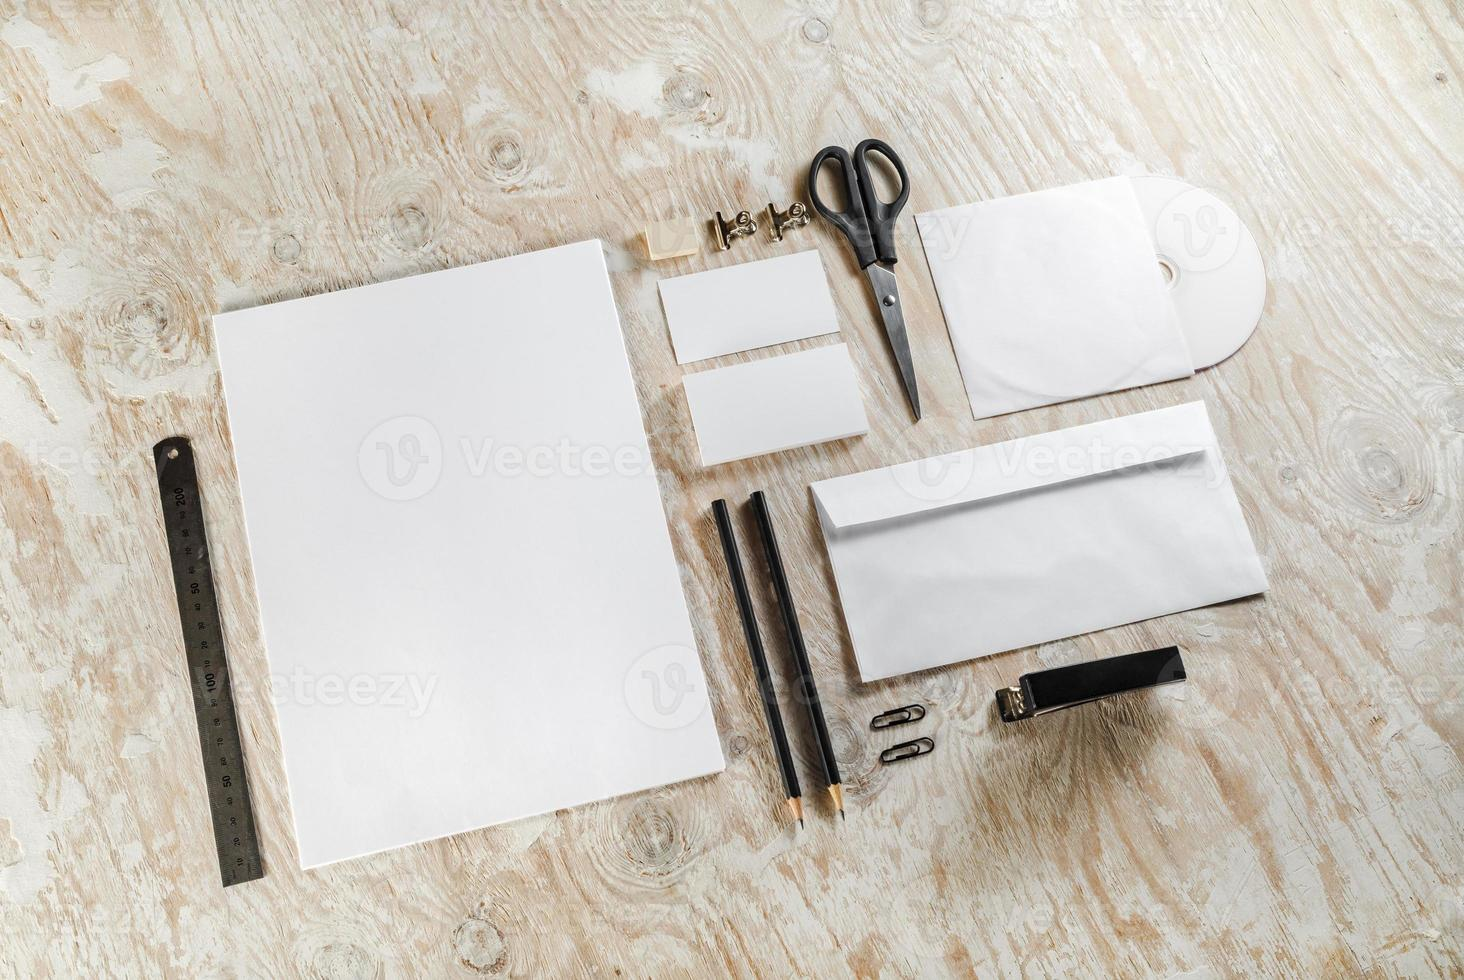 Schreibwaren-Set foto